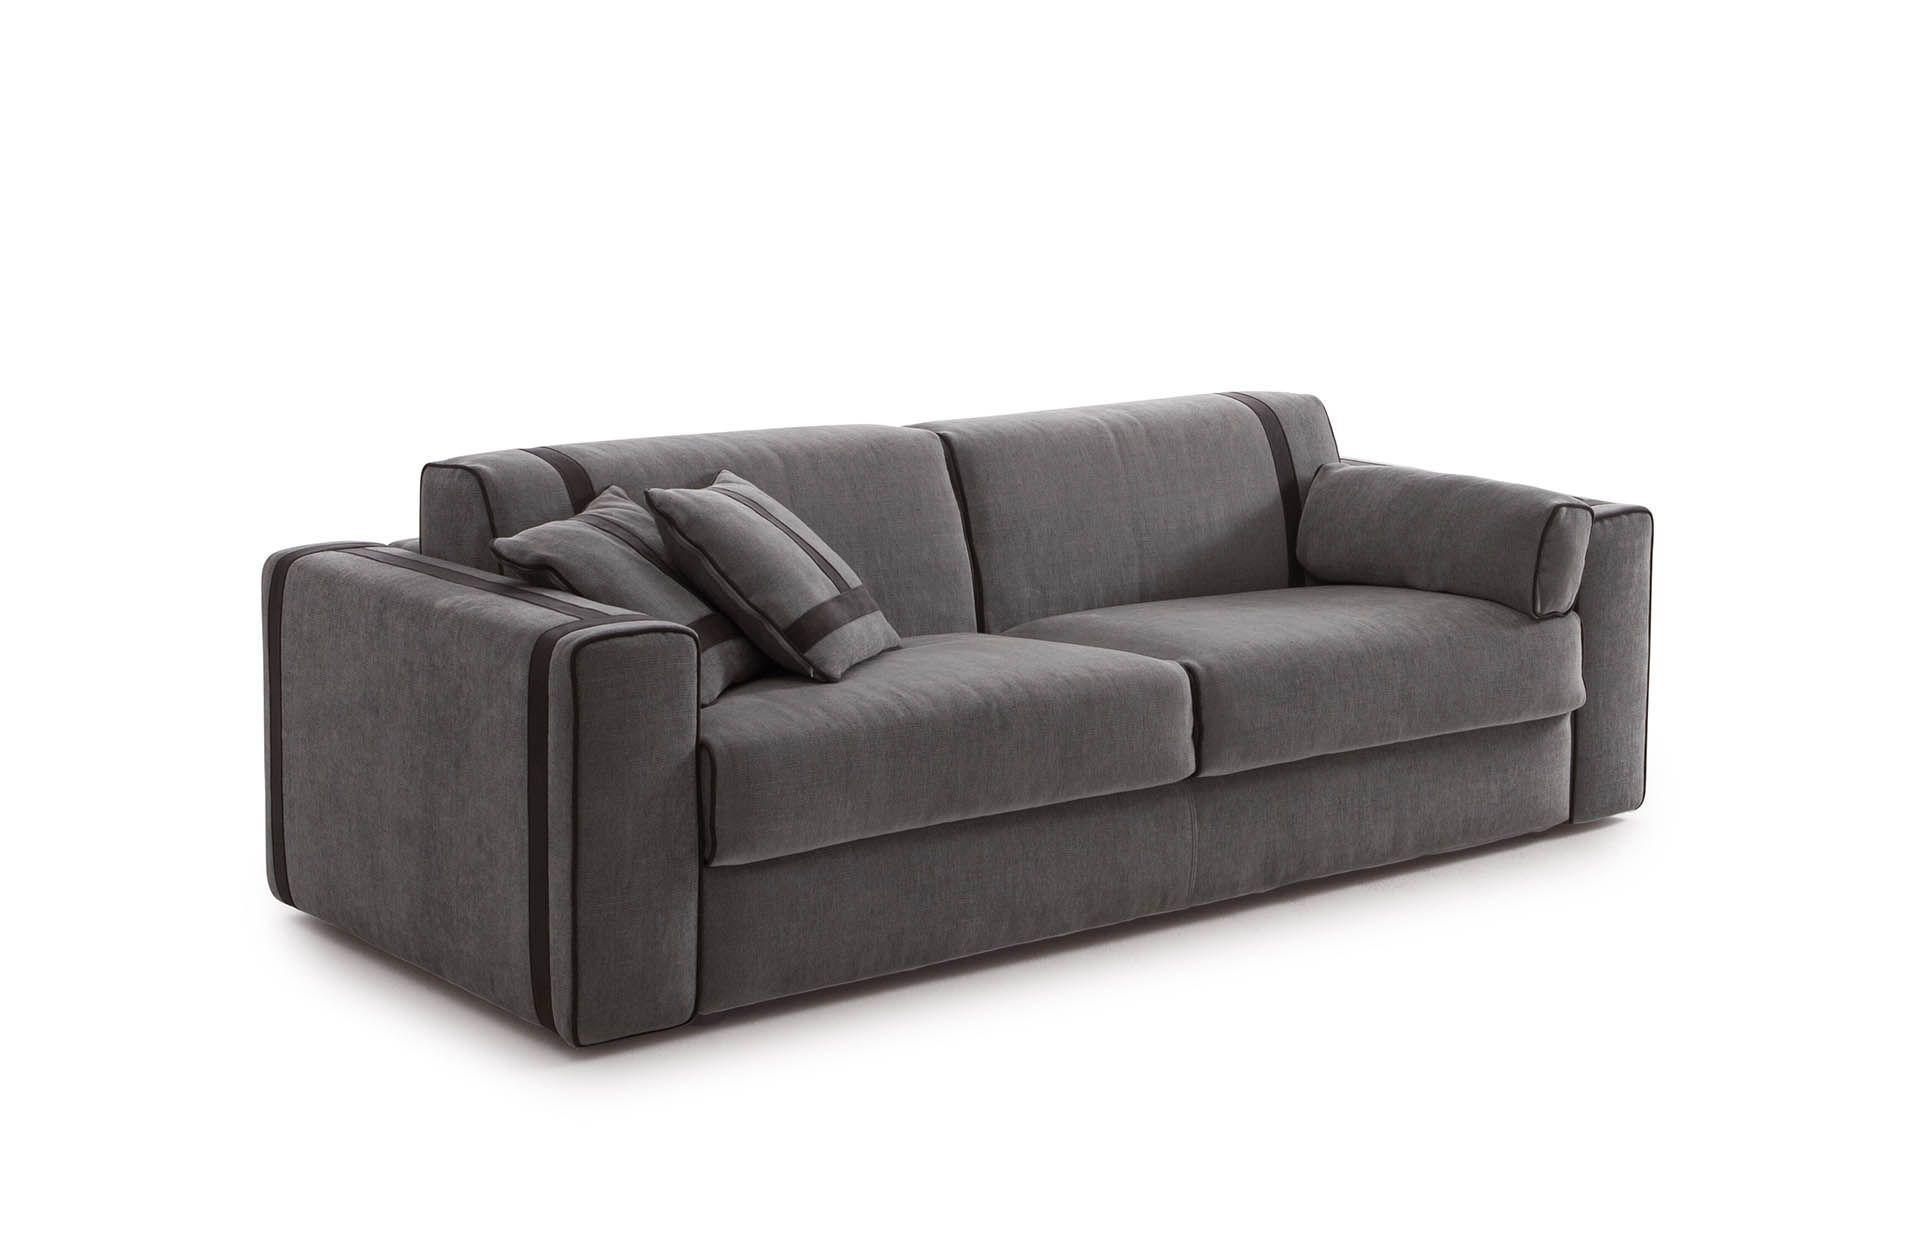 Milano Bedding divano letto ellington Мебель